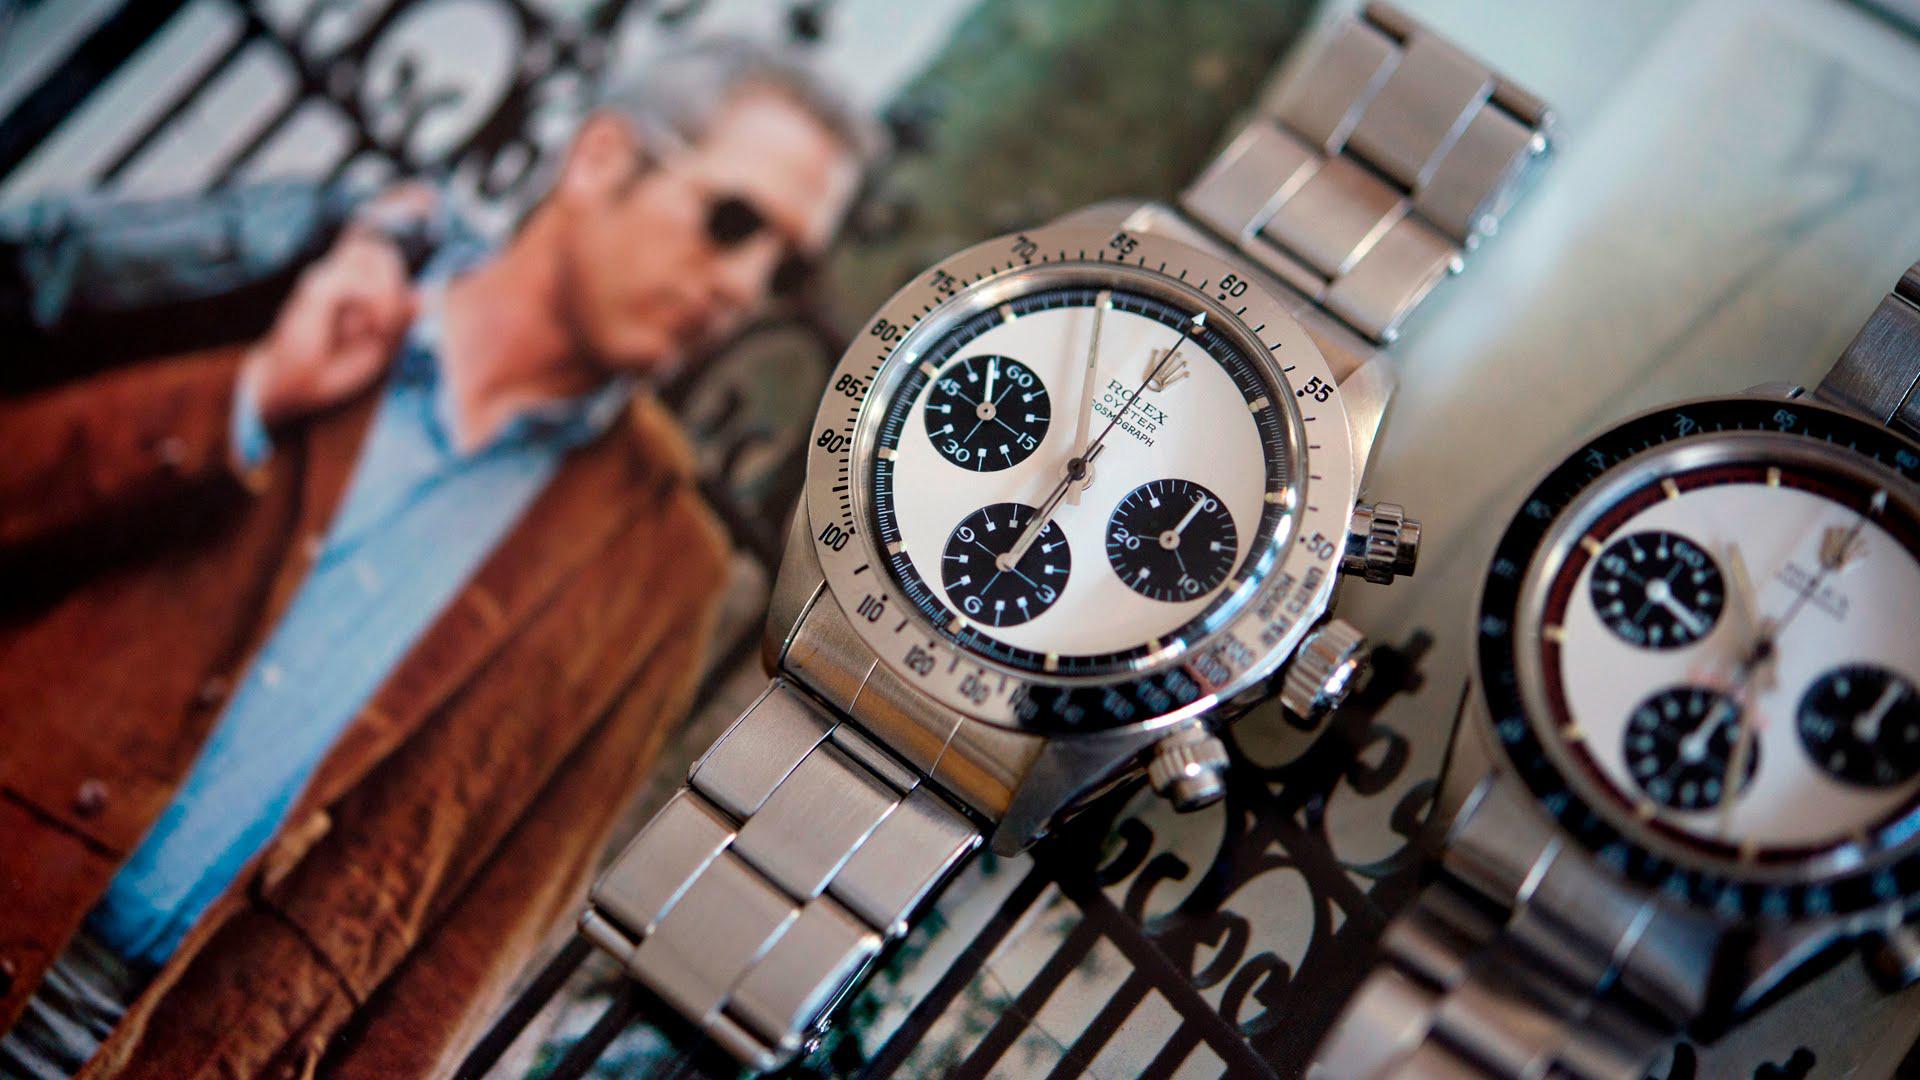 Ocelový chronograf Daytona proslavil herec Paul Newman.